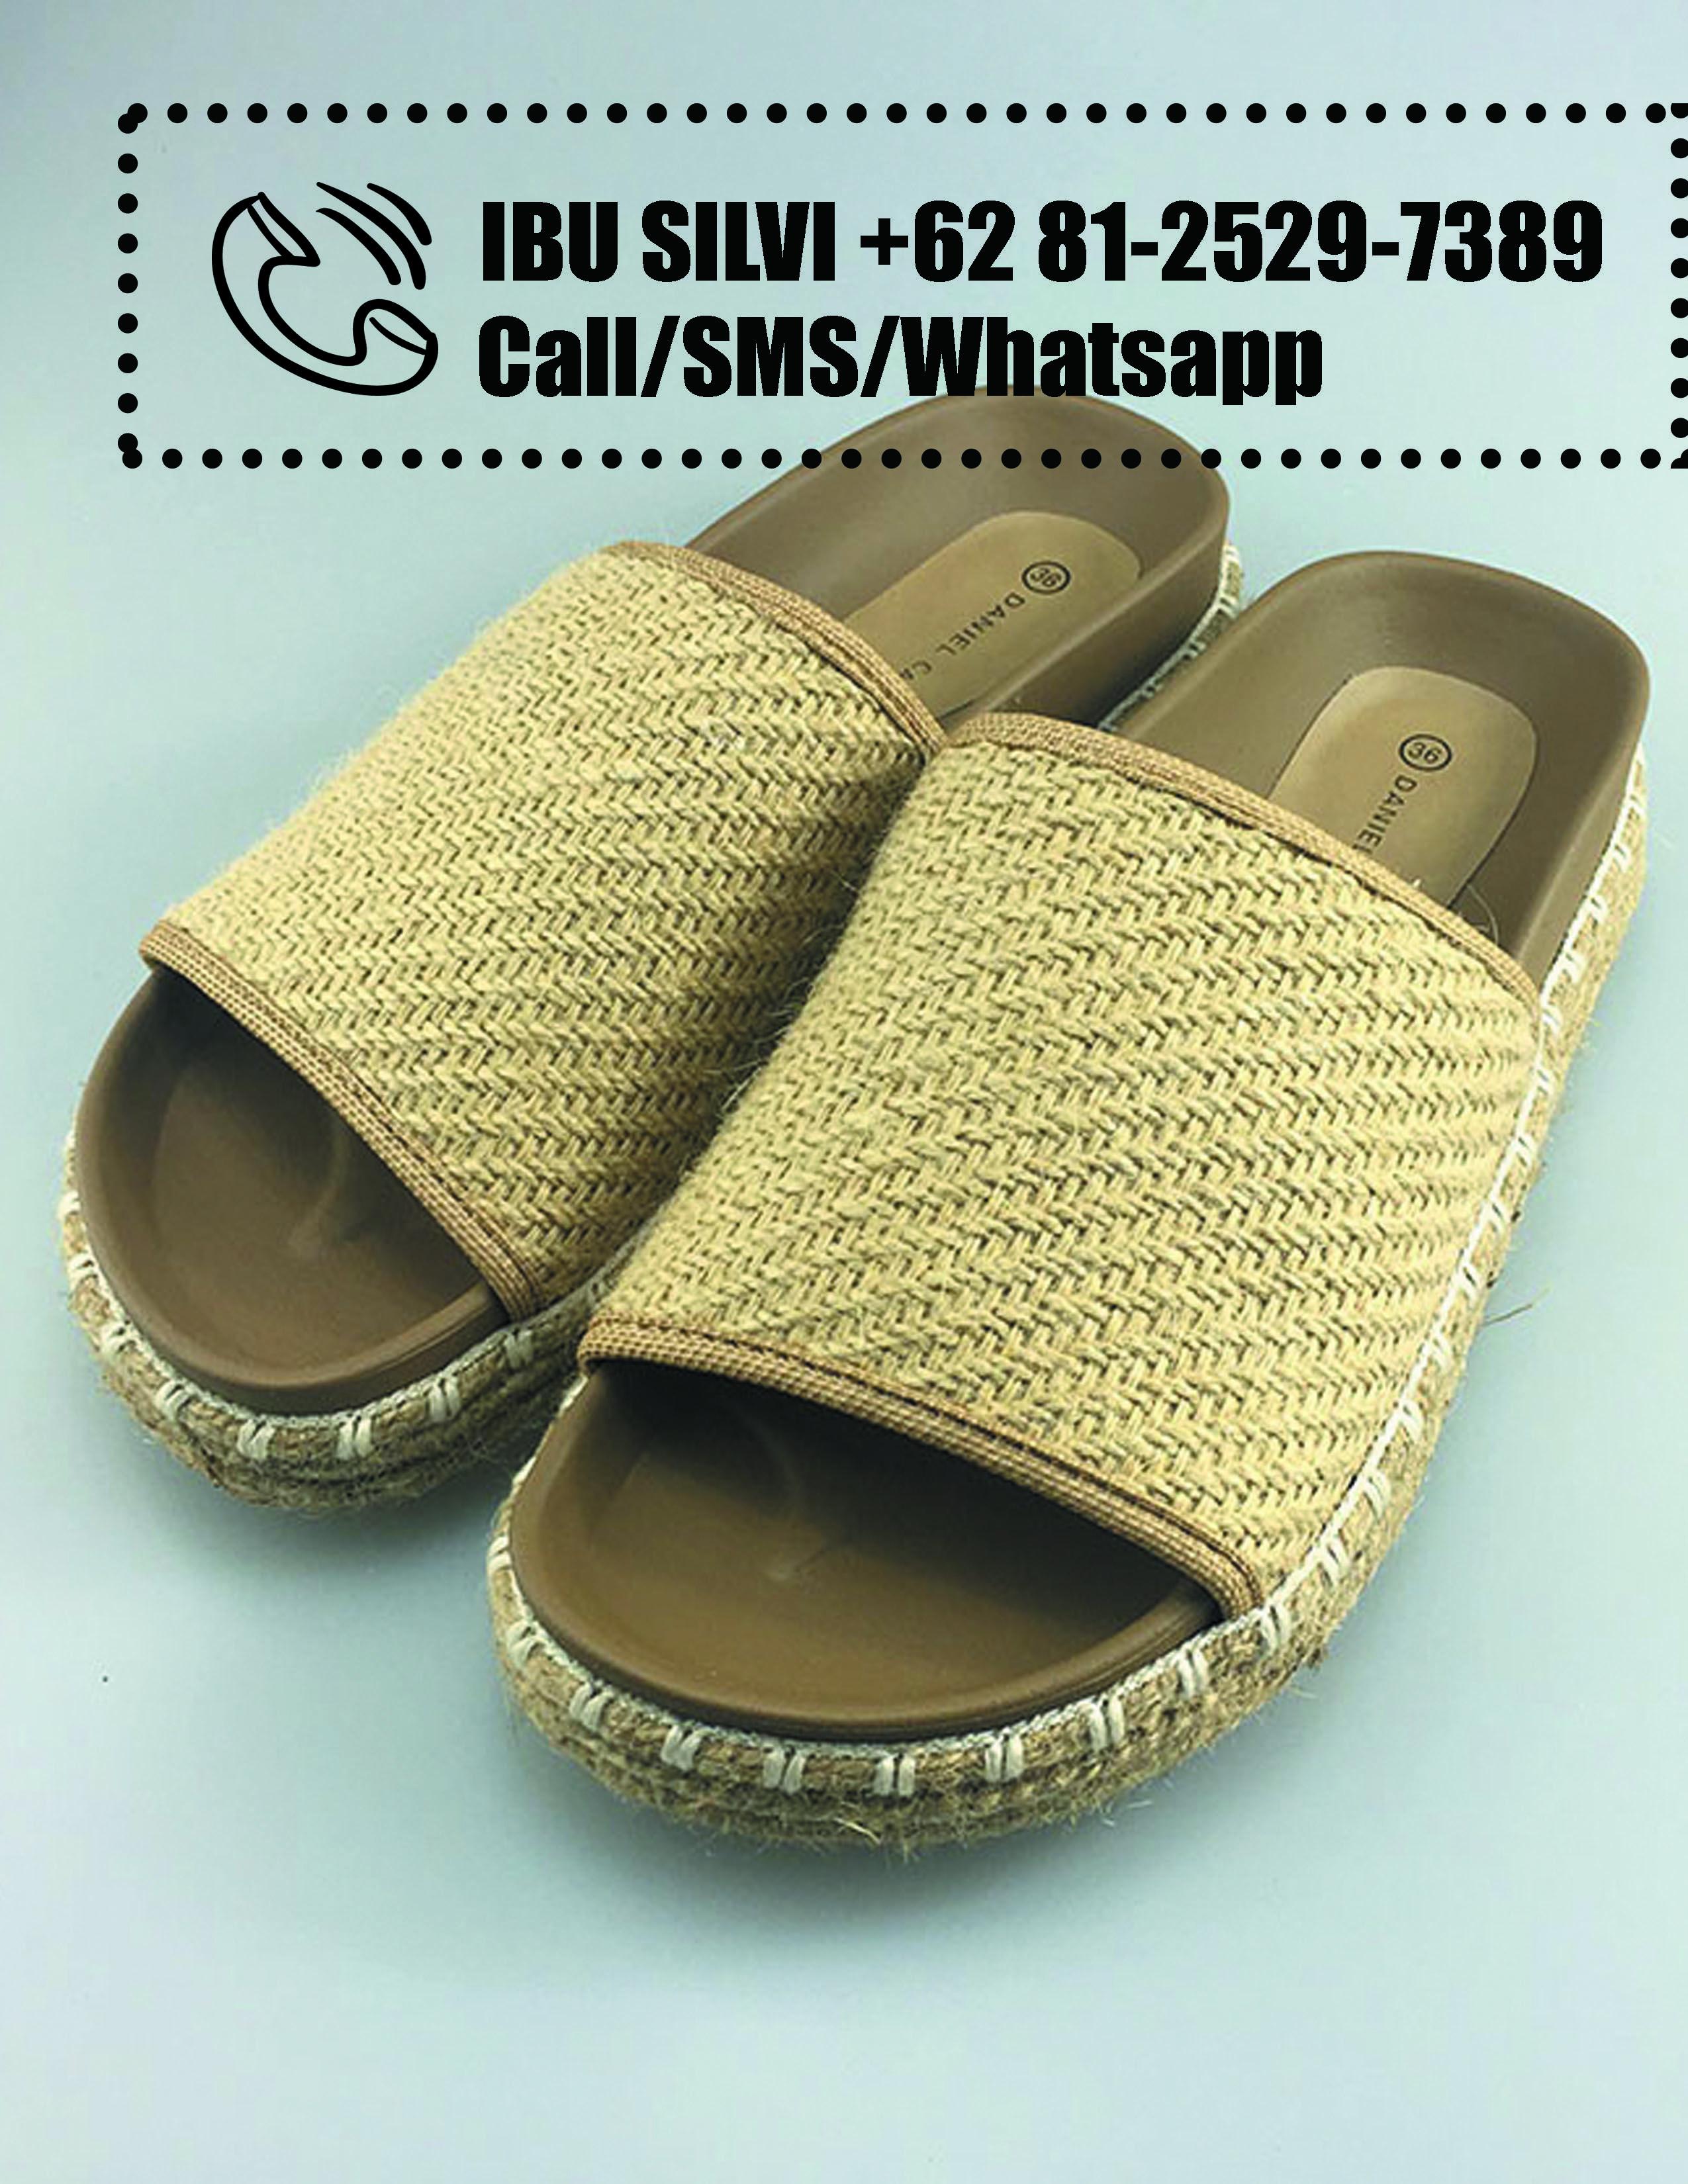 3be0a3d46 Pin by Distributor Sandal on Promo Termurah!! +62 812-5297-389 (TSEL)  Sandal Anyaman Murah Hotel Murah